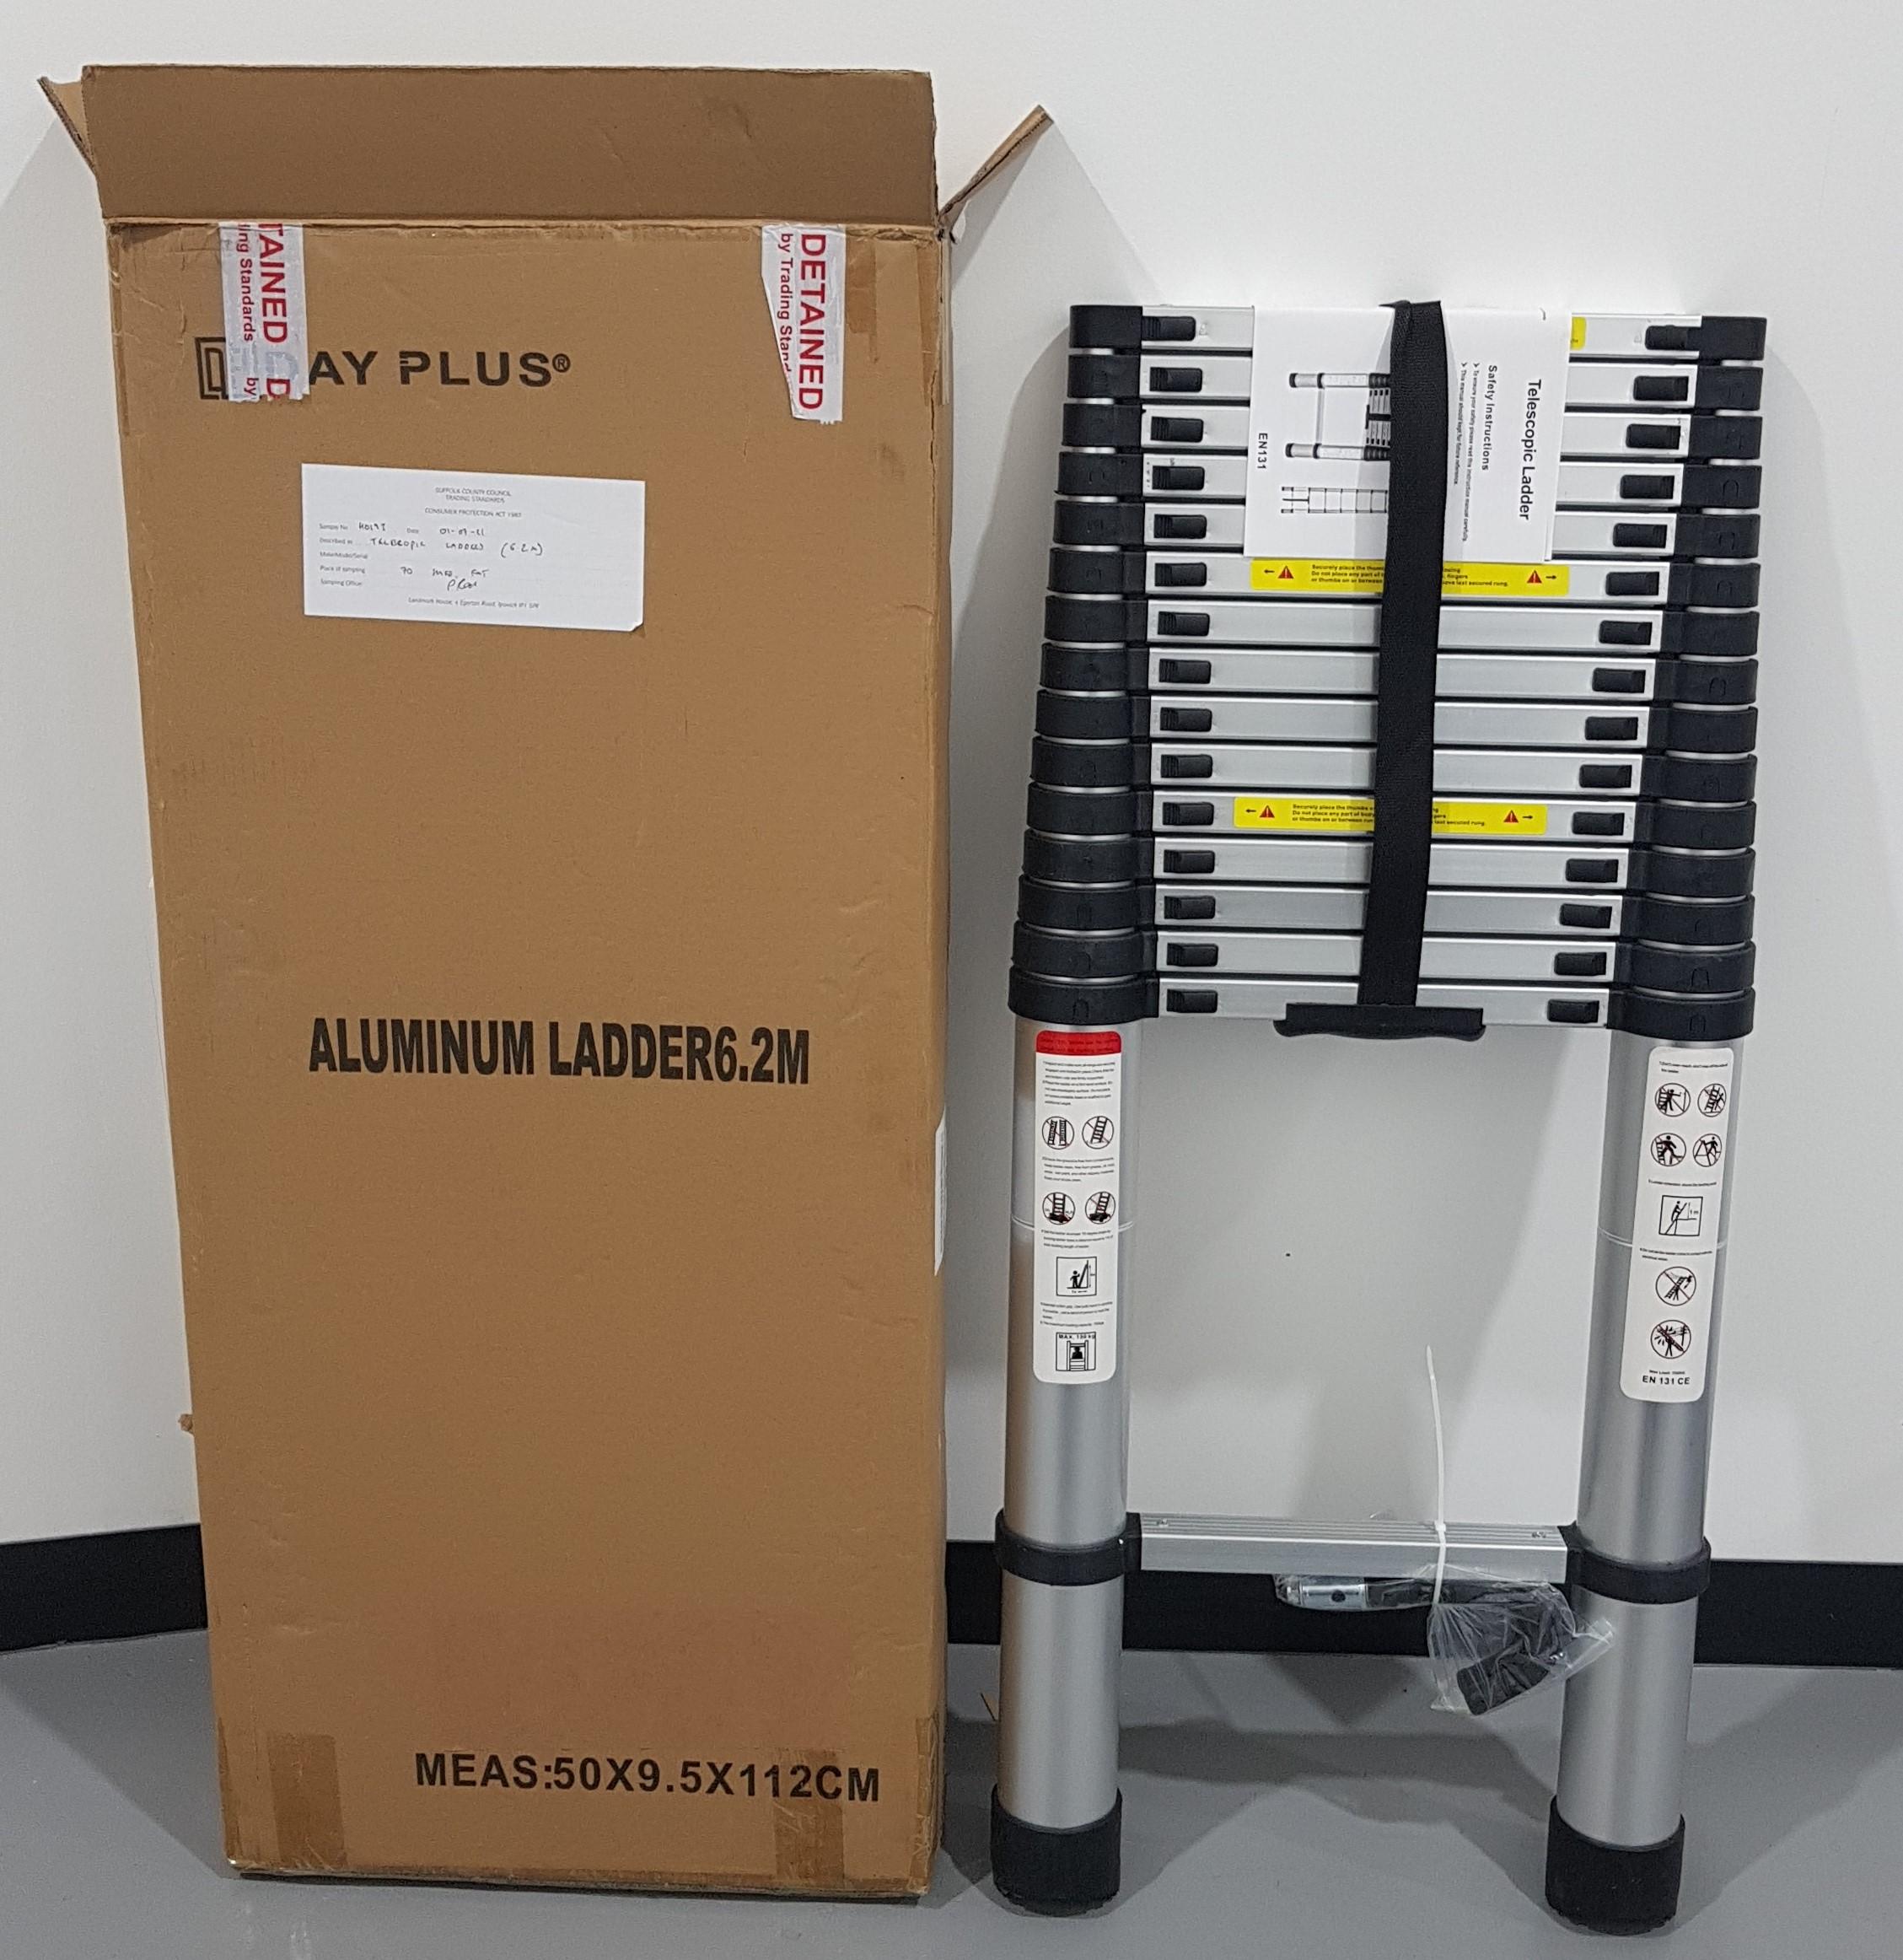 6.2m telescopic ladder